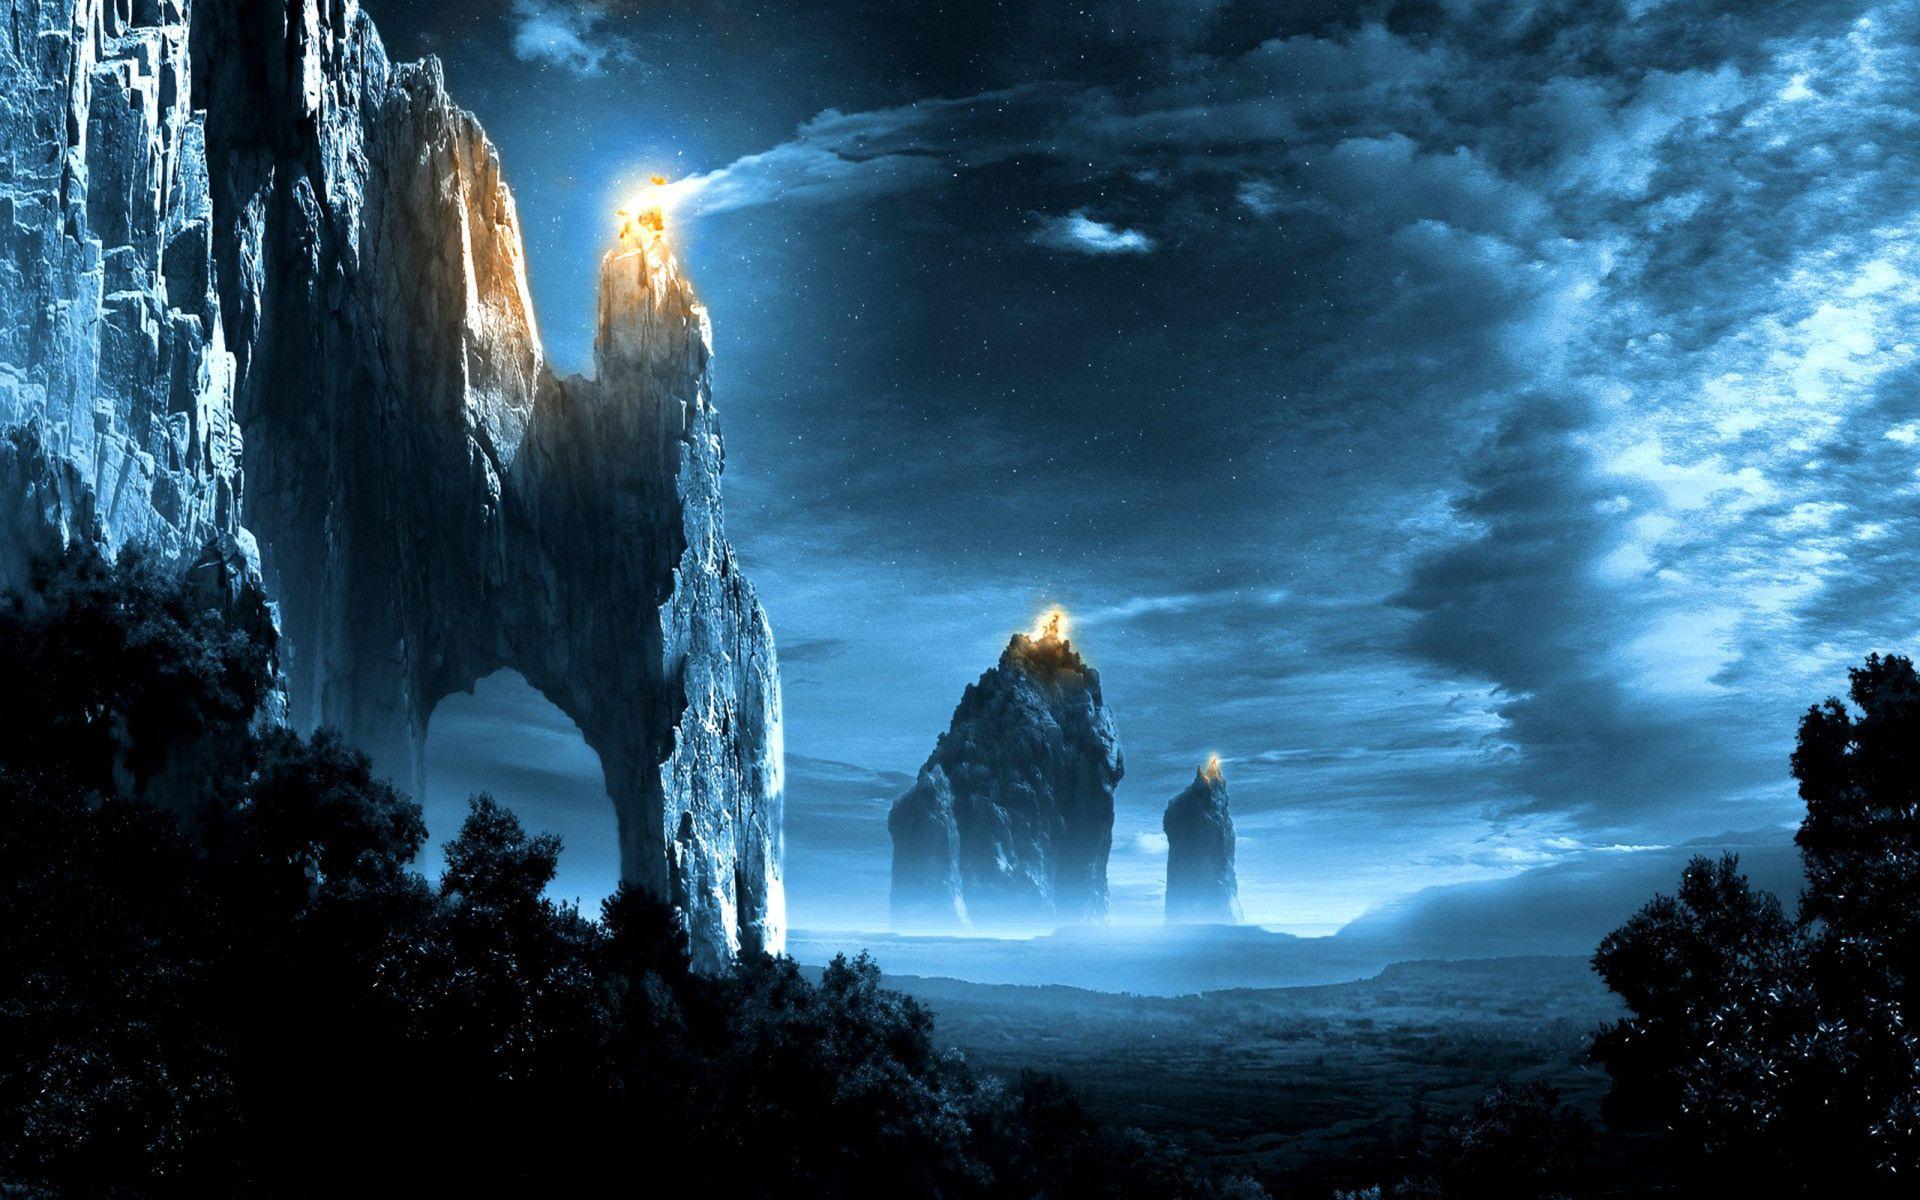 Fantasy Landscape Wallpapers Paysages D Art Fantastique Art Paysagiste Art Fantastique